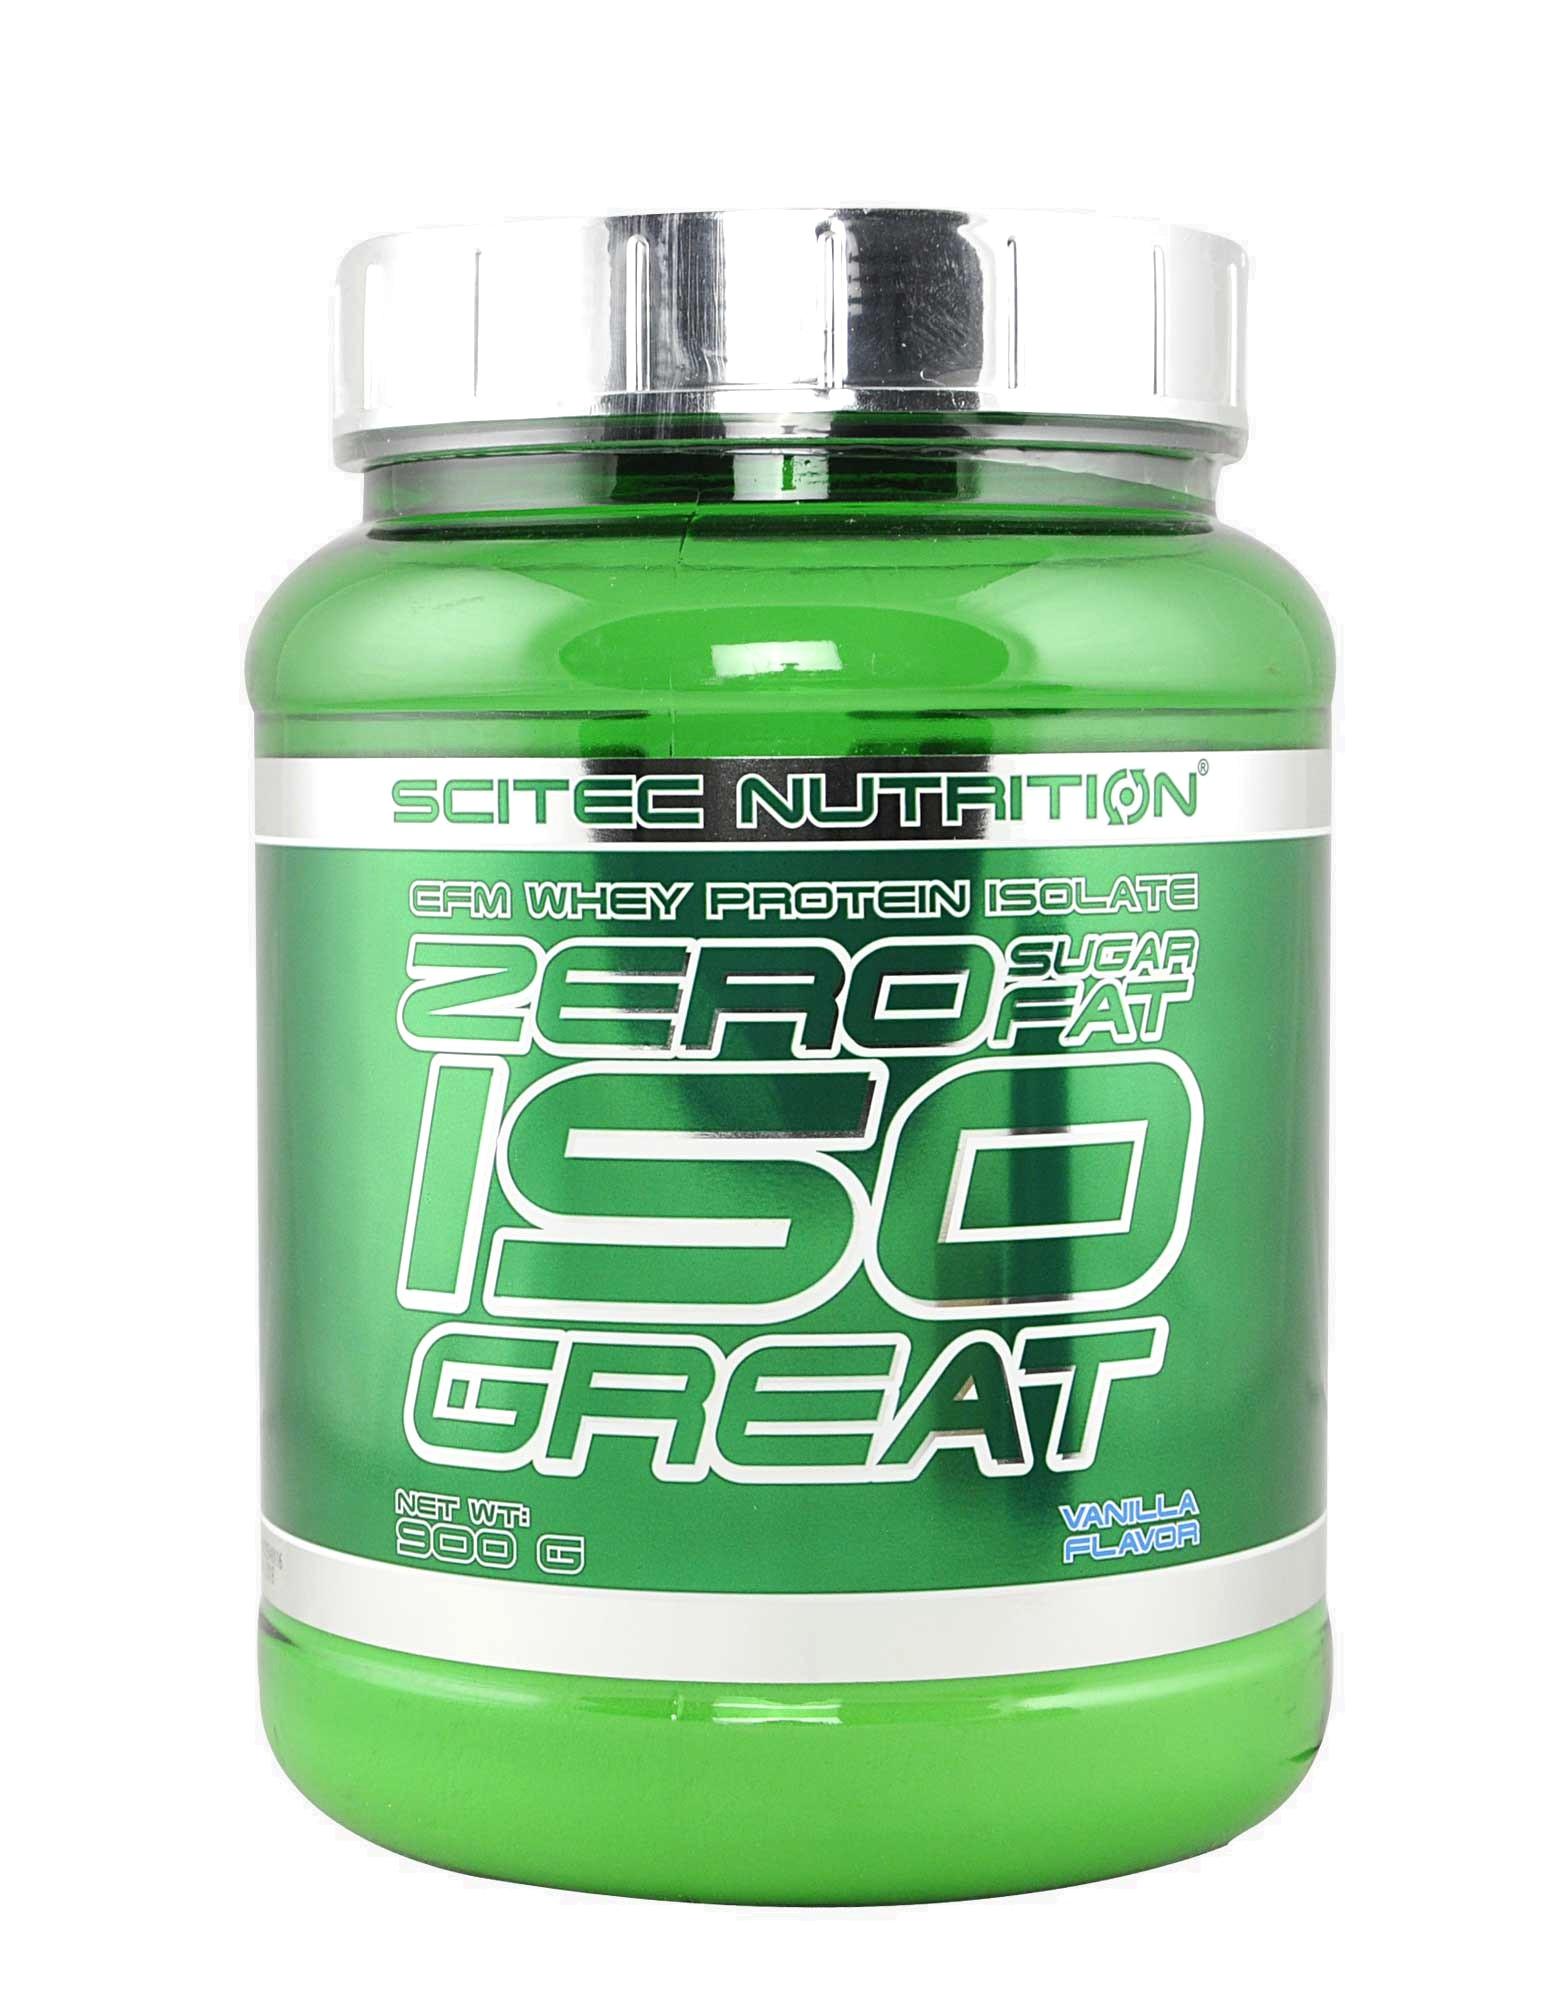 zero sugar zero fat iso great by scitec nutrition 900 grams. Black Bedroom Furniture Sets. Home Design Ideas